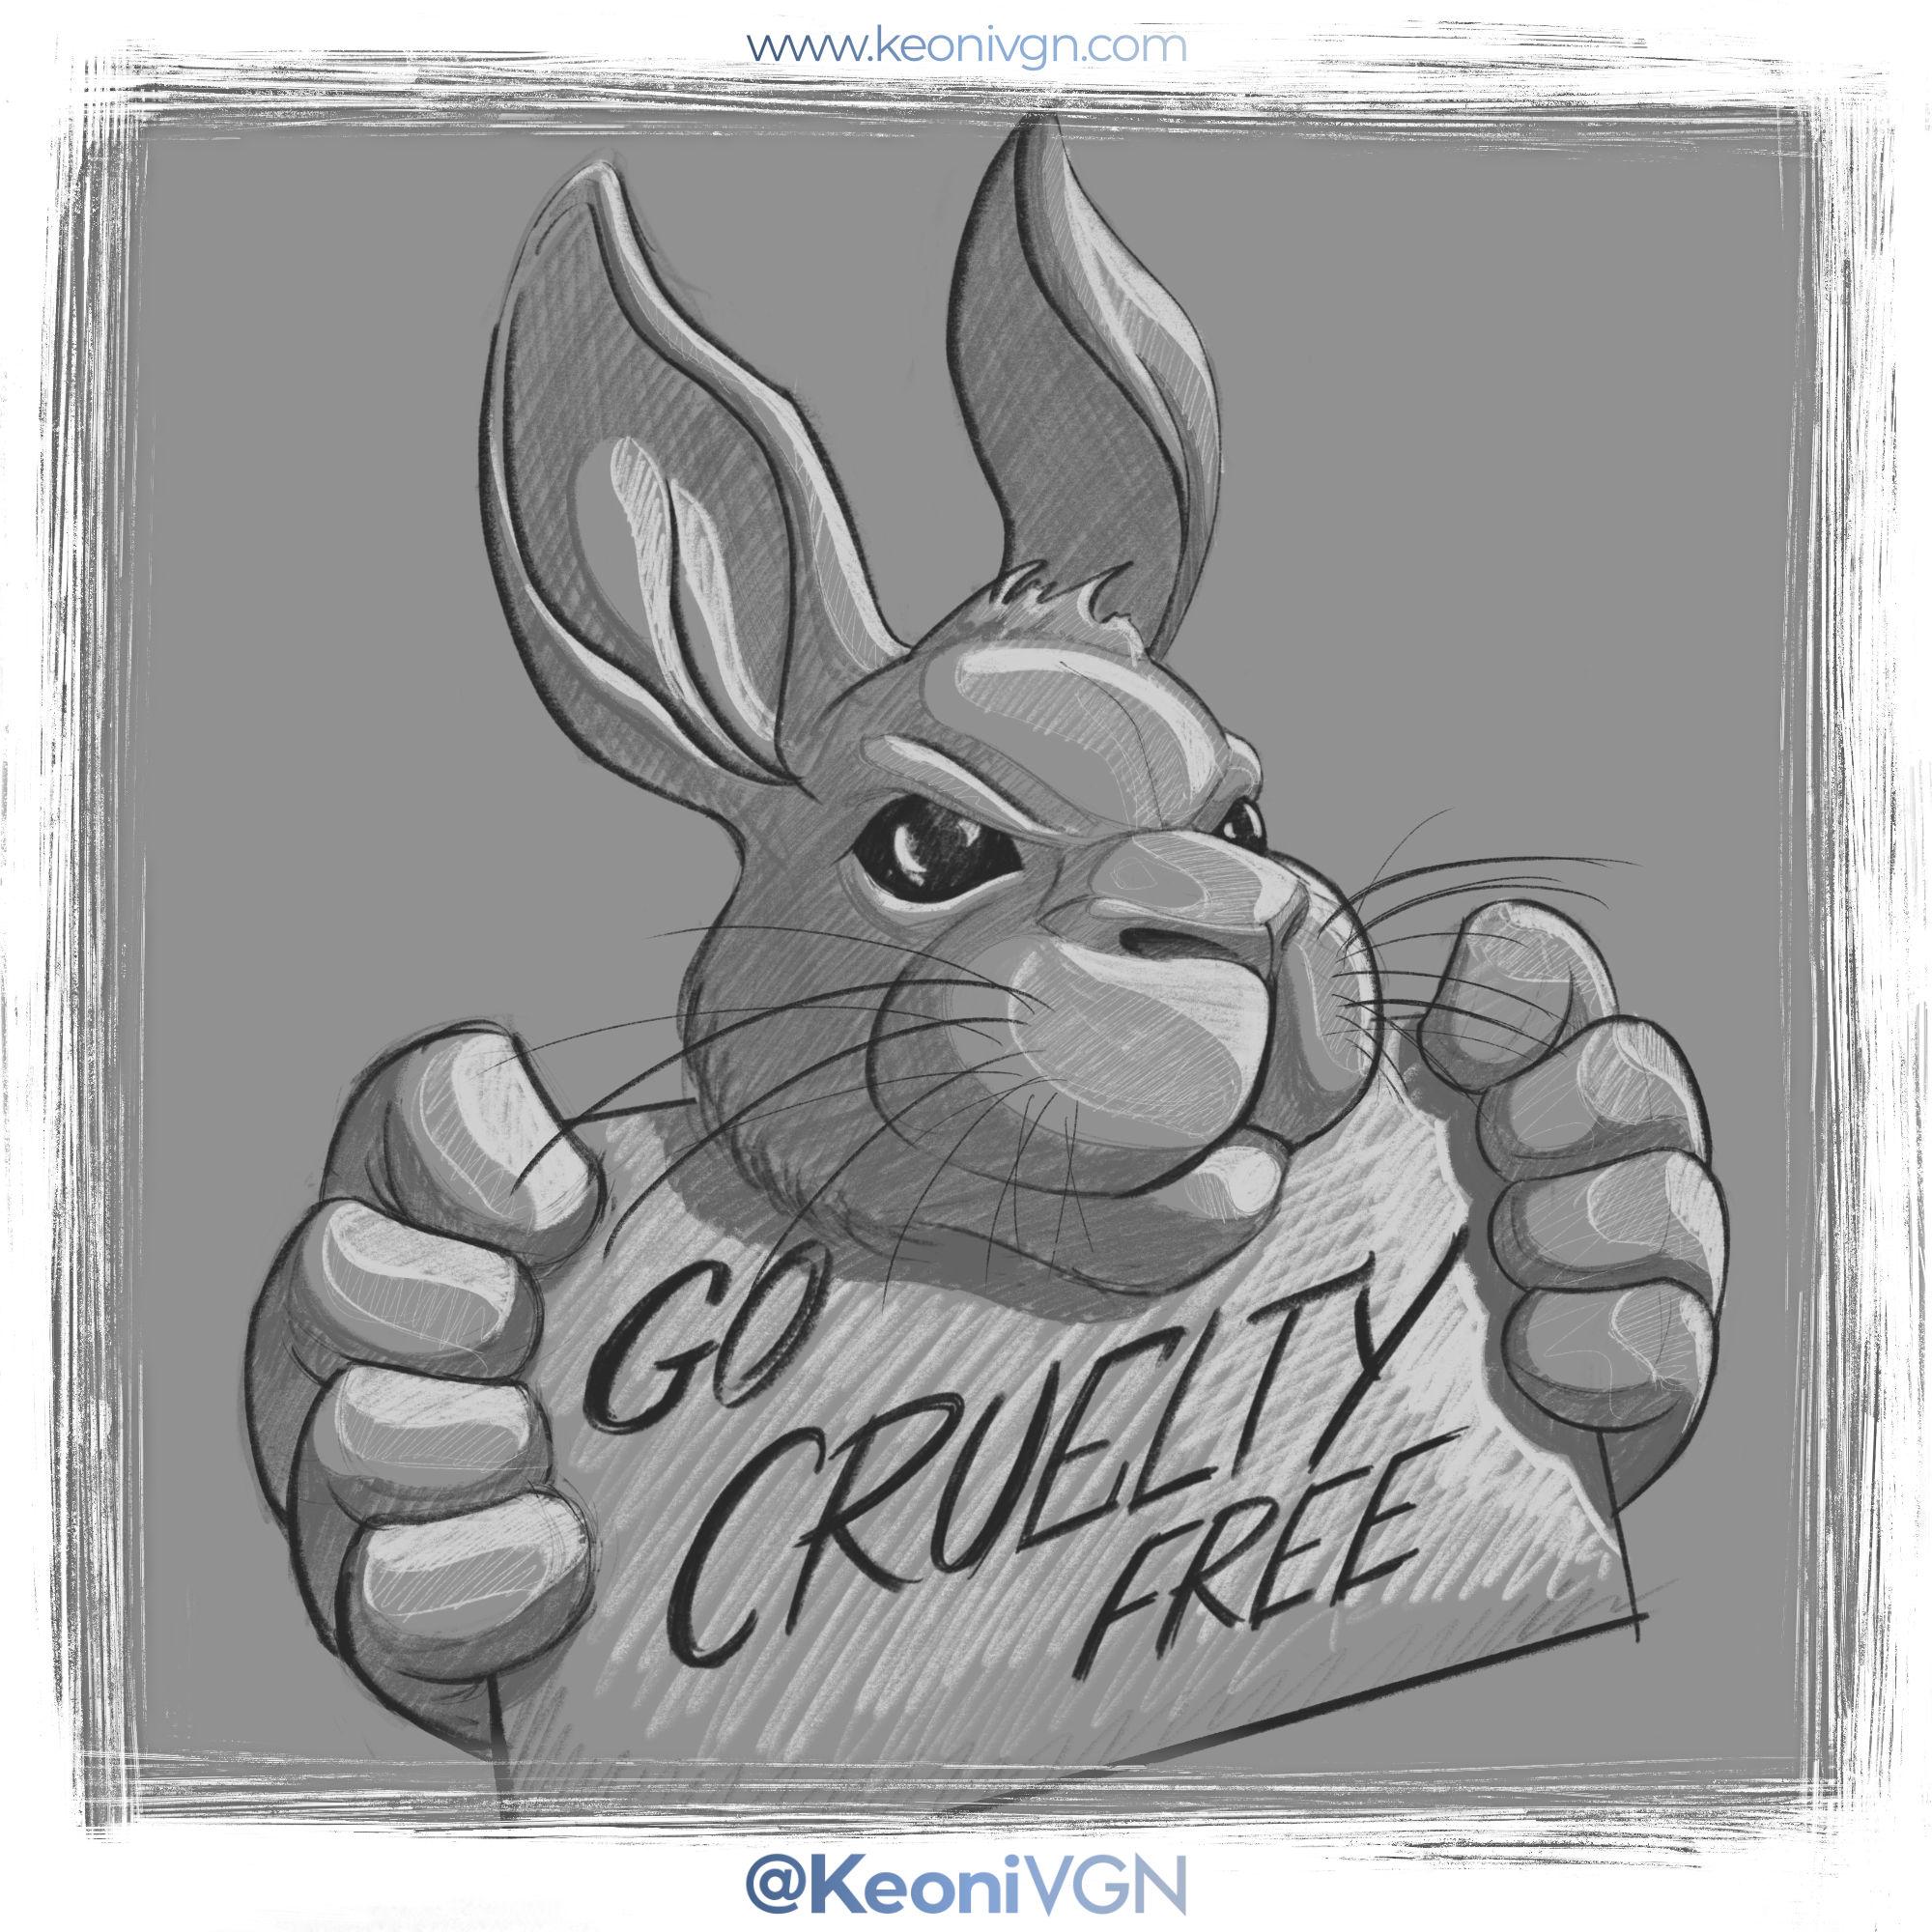 proyecto Cruelty Free